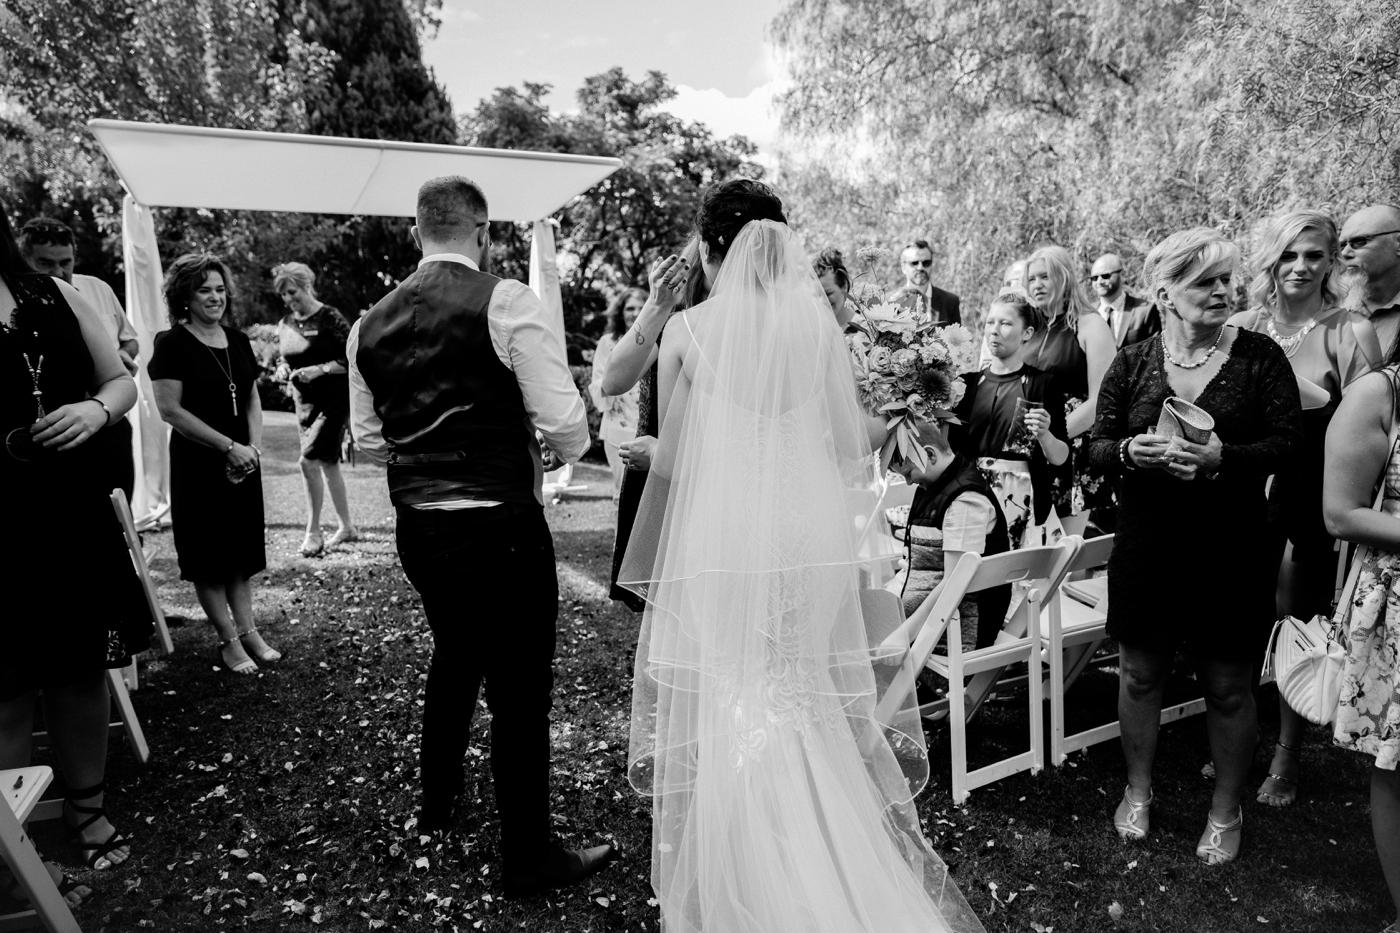 Emma & Aaron - Marybank Estate Wedding - Natural Wedding Photography in Adelaide - www.katherineschultzphotography.com_0040.jpg